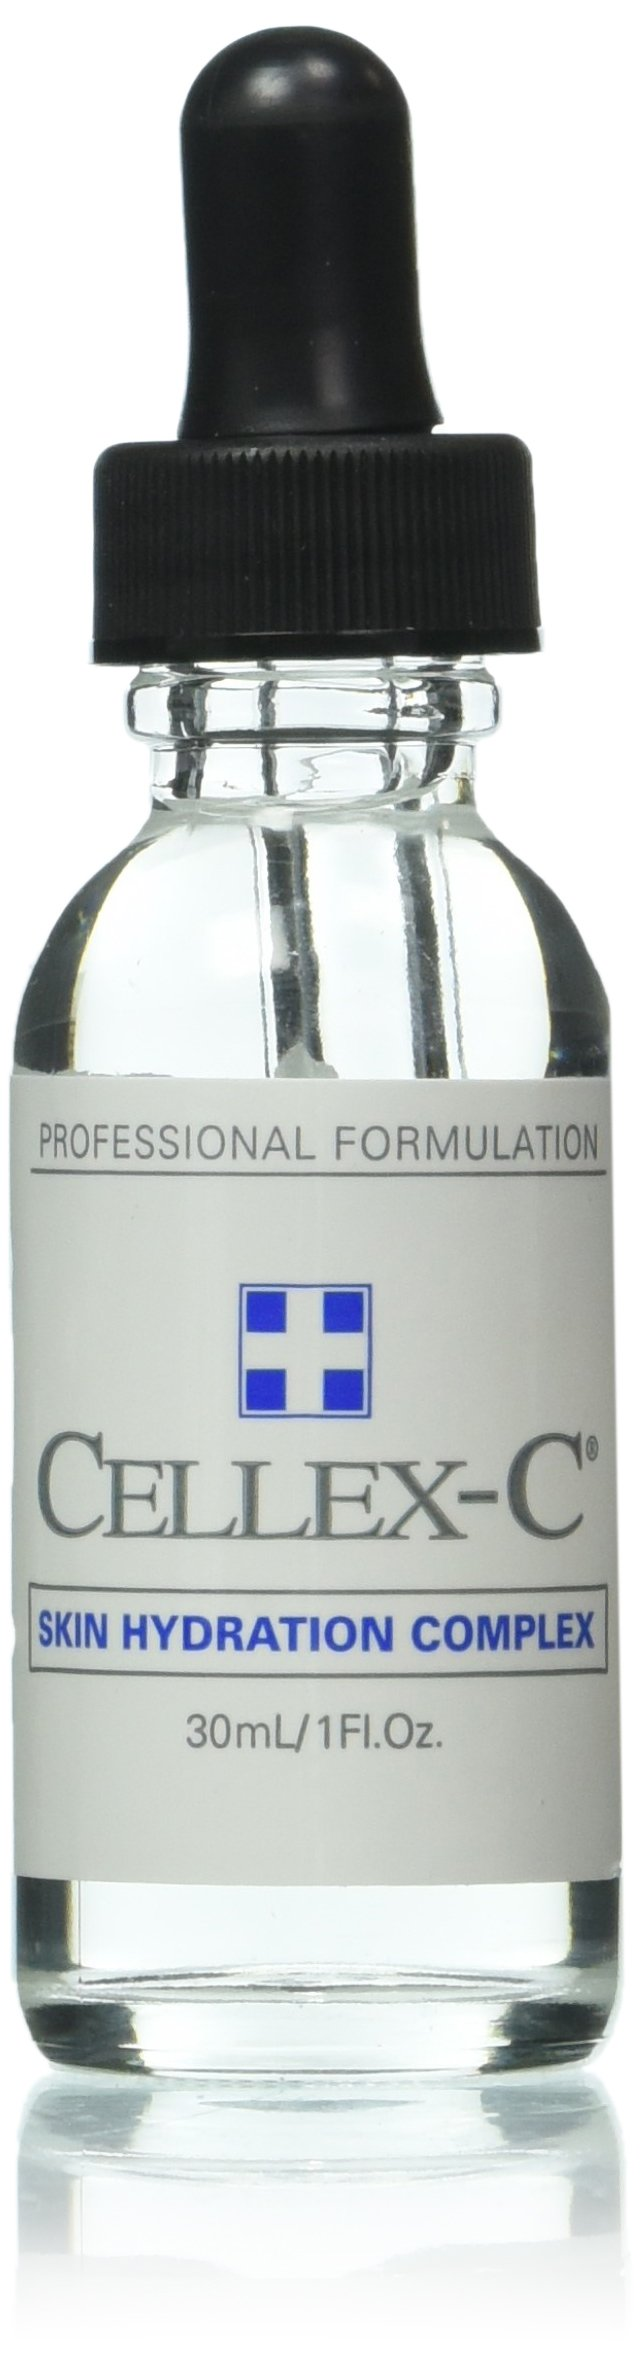 Cellex-C Skin Hydration Complex, Professional Formulation, 30 ml/1 oz